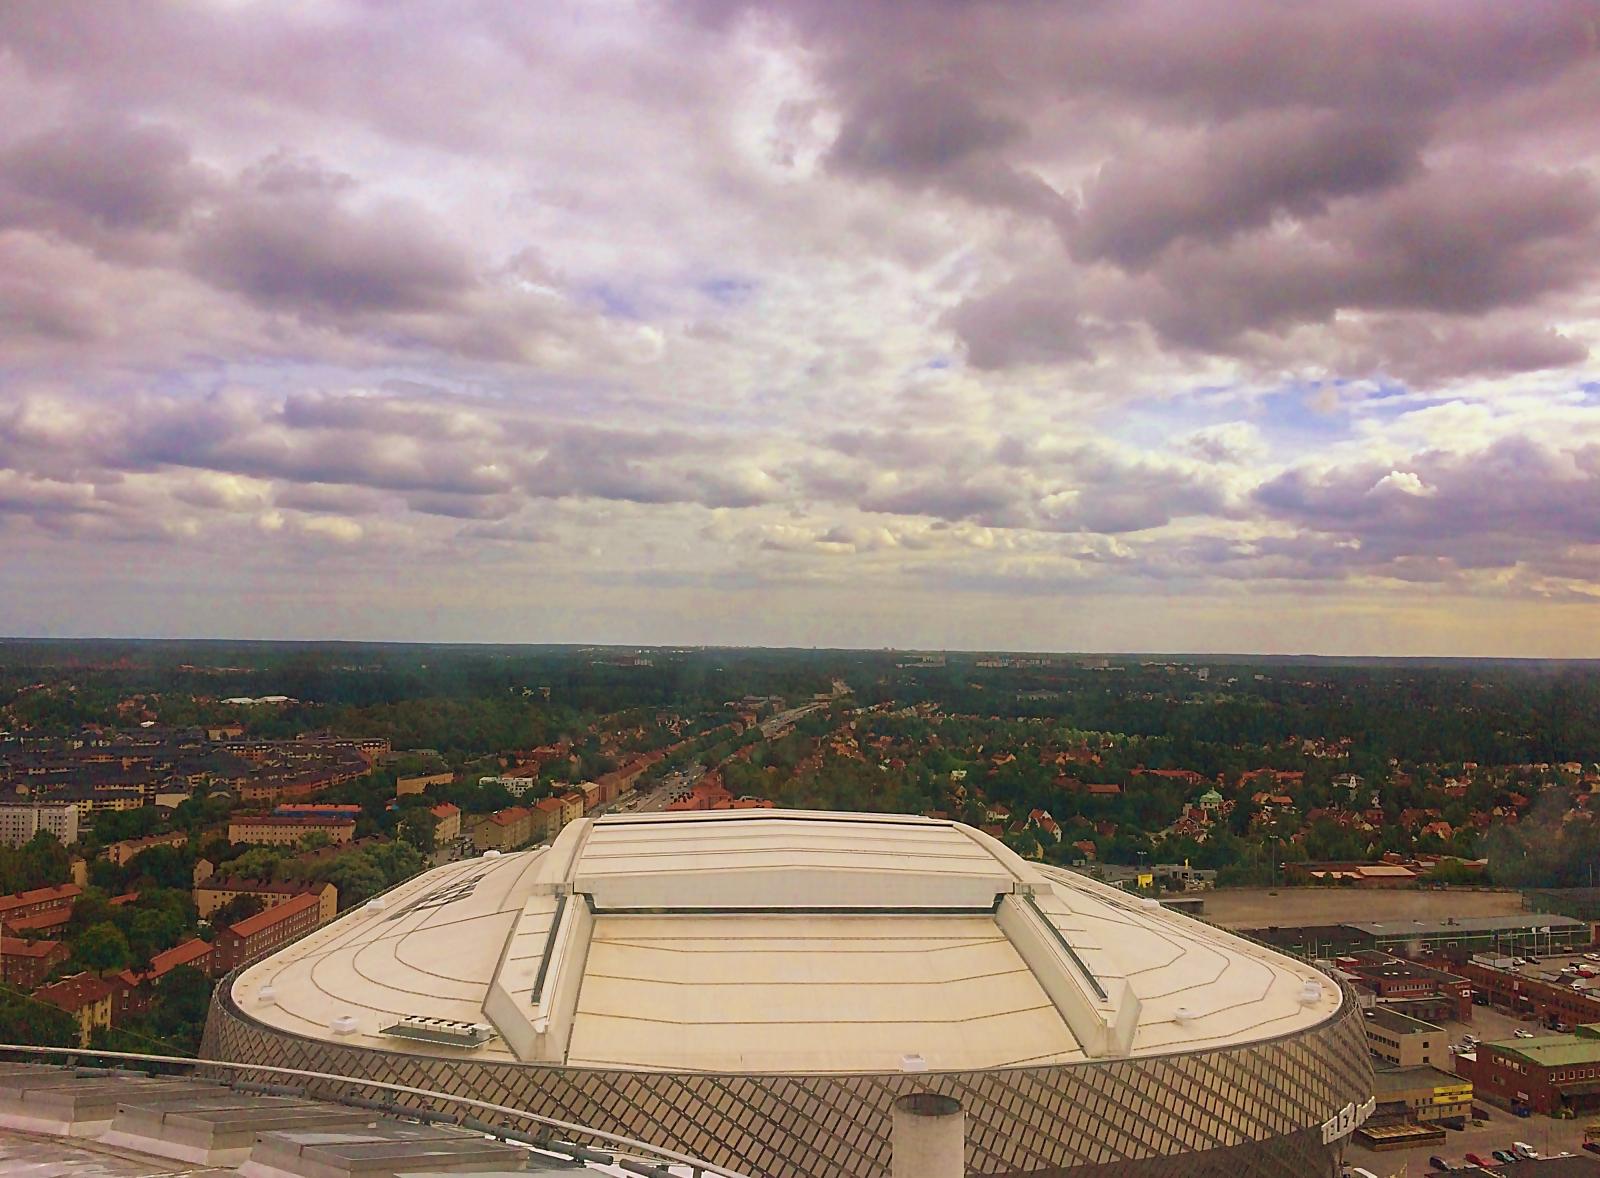 Ericsson Globe Arena Top